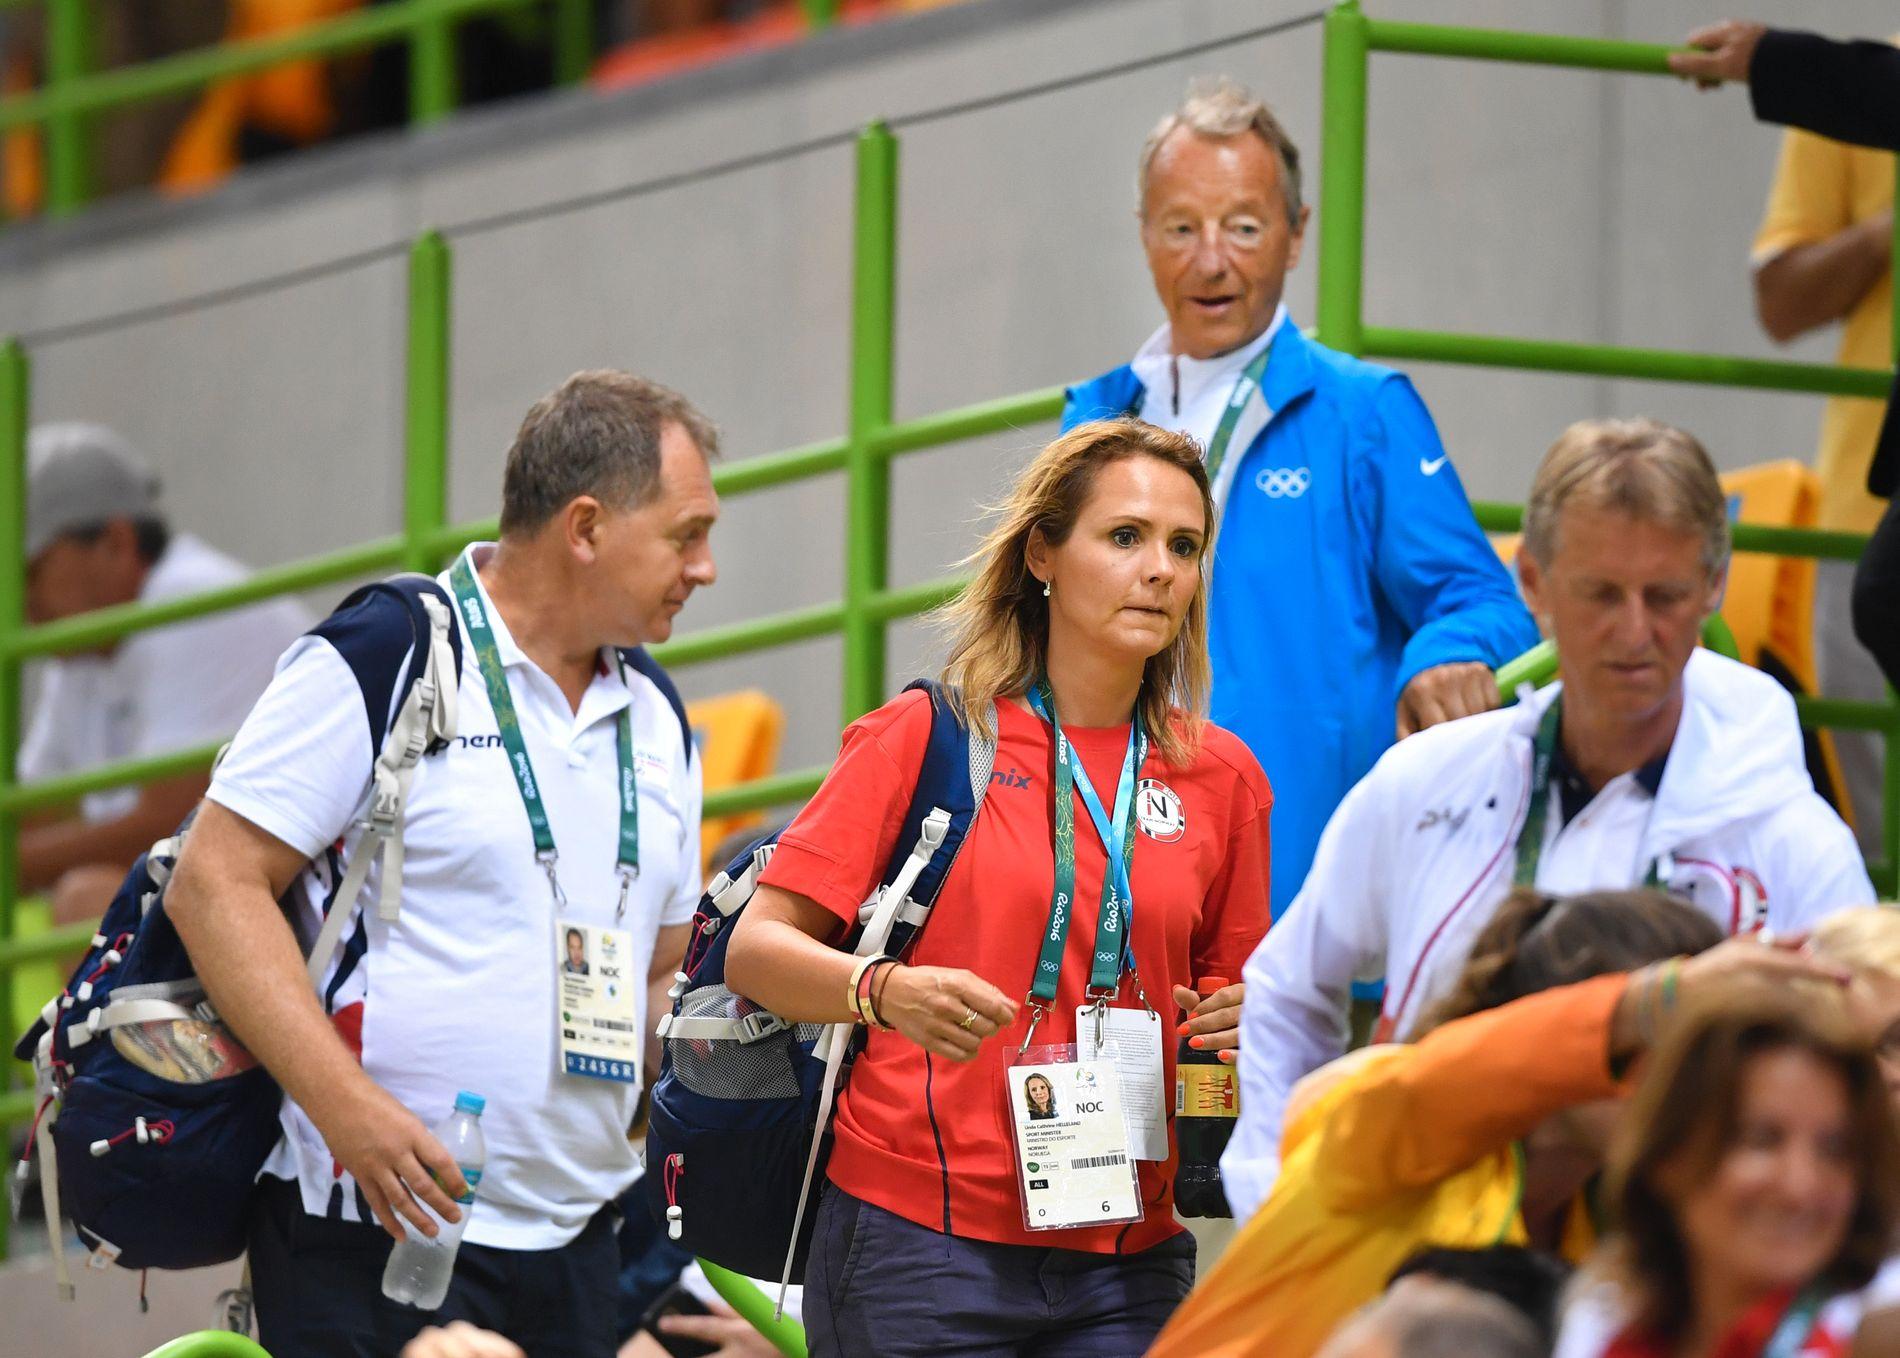 NY WADA-TOPP: Linda Hofstad Helleland, her under en håndballkamp under Rio-OL, er valg til ny visepresident i WADA. Det skjedde på en konferanse i Glasgow søndag morgen.